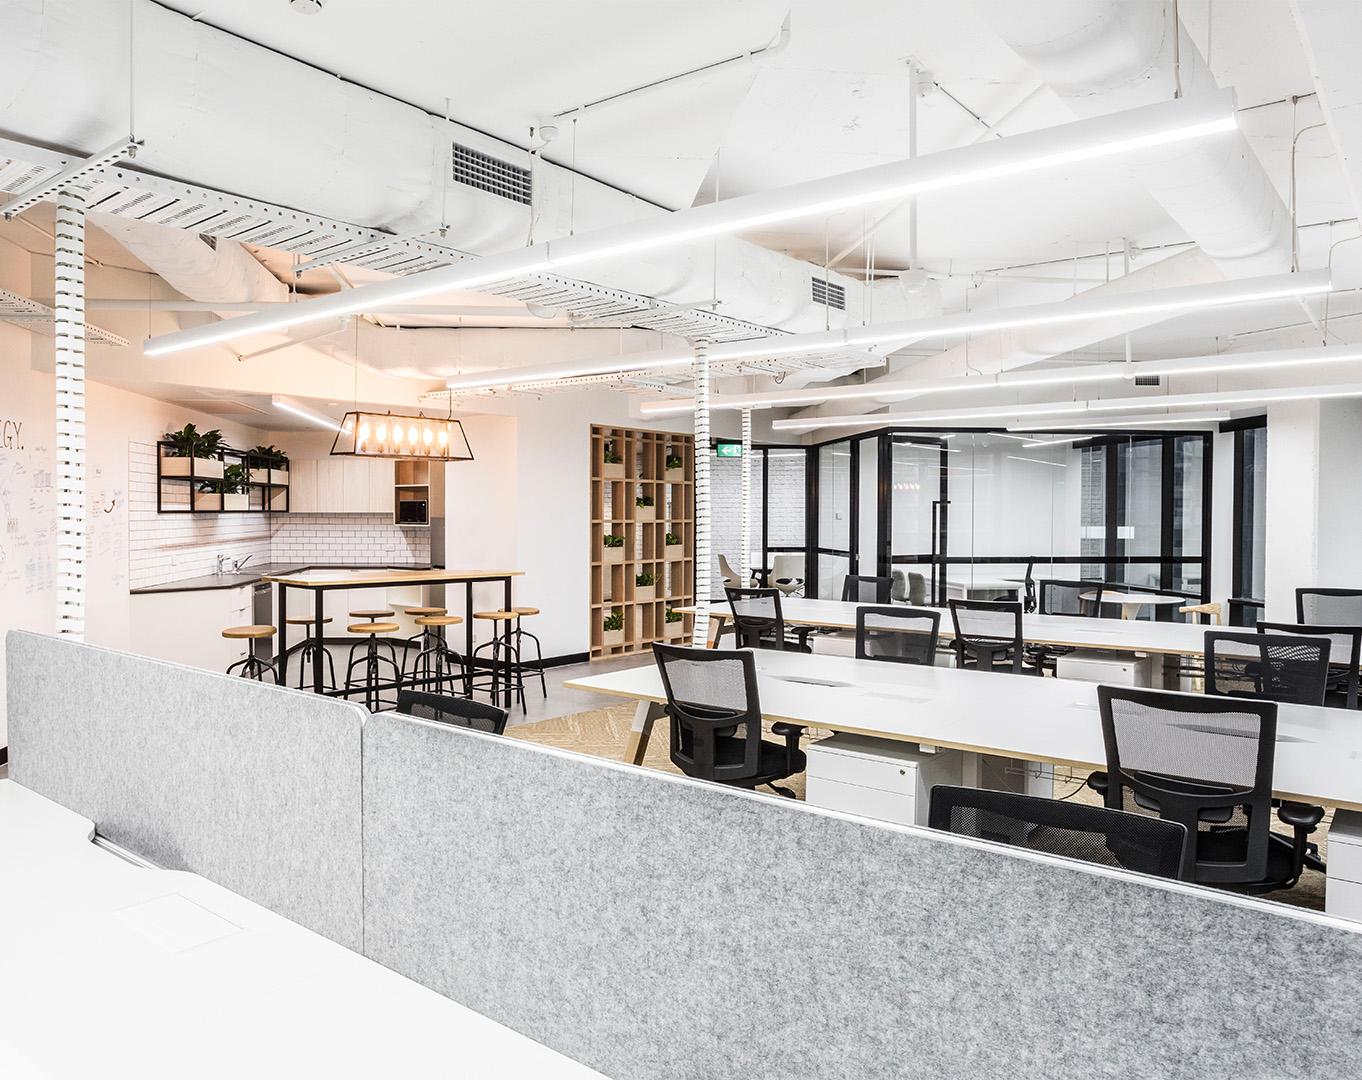 Archway - Quadra - T3 -Lunchroom 02.jpg